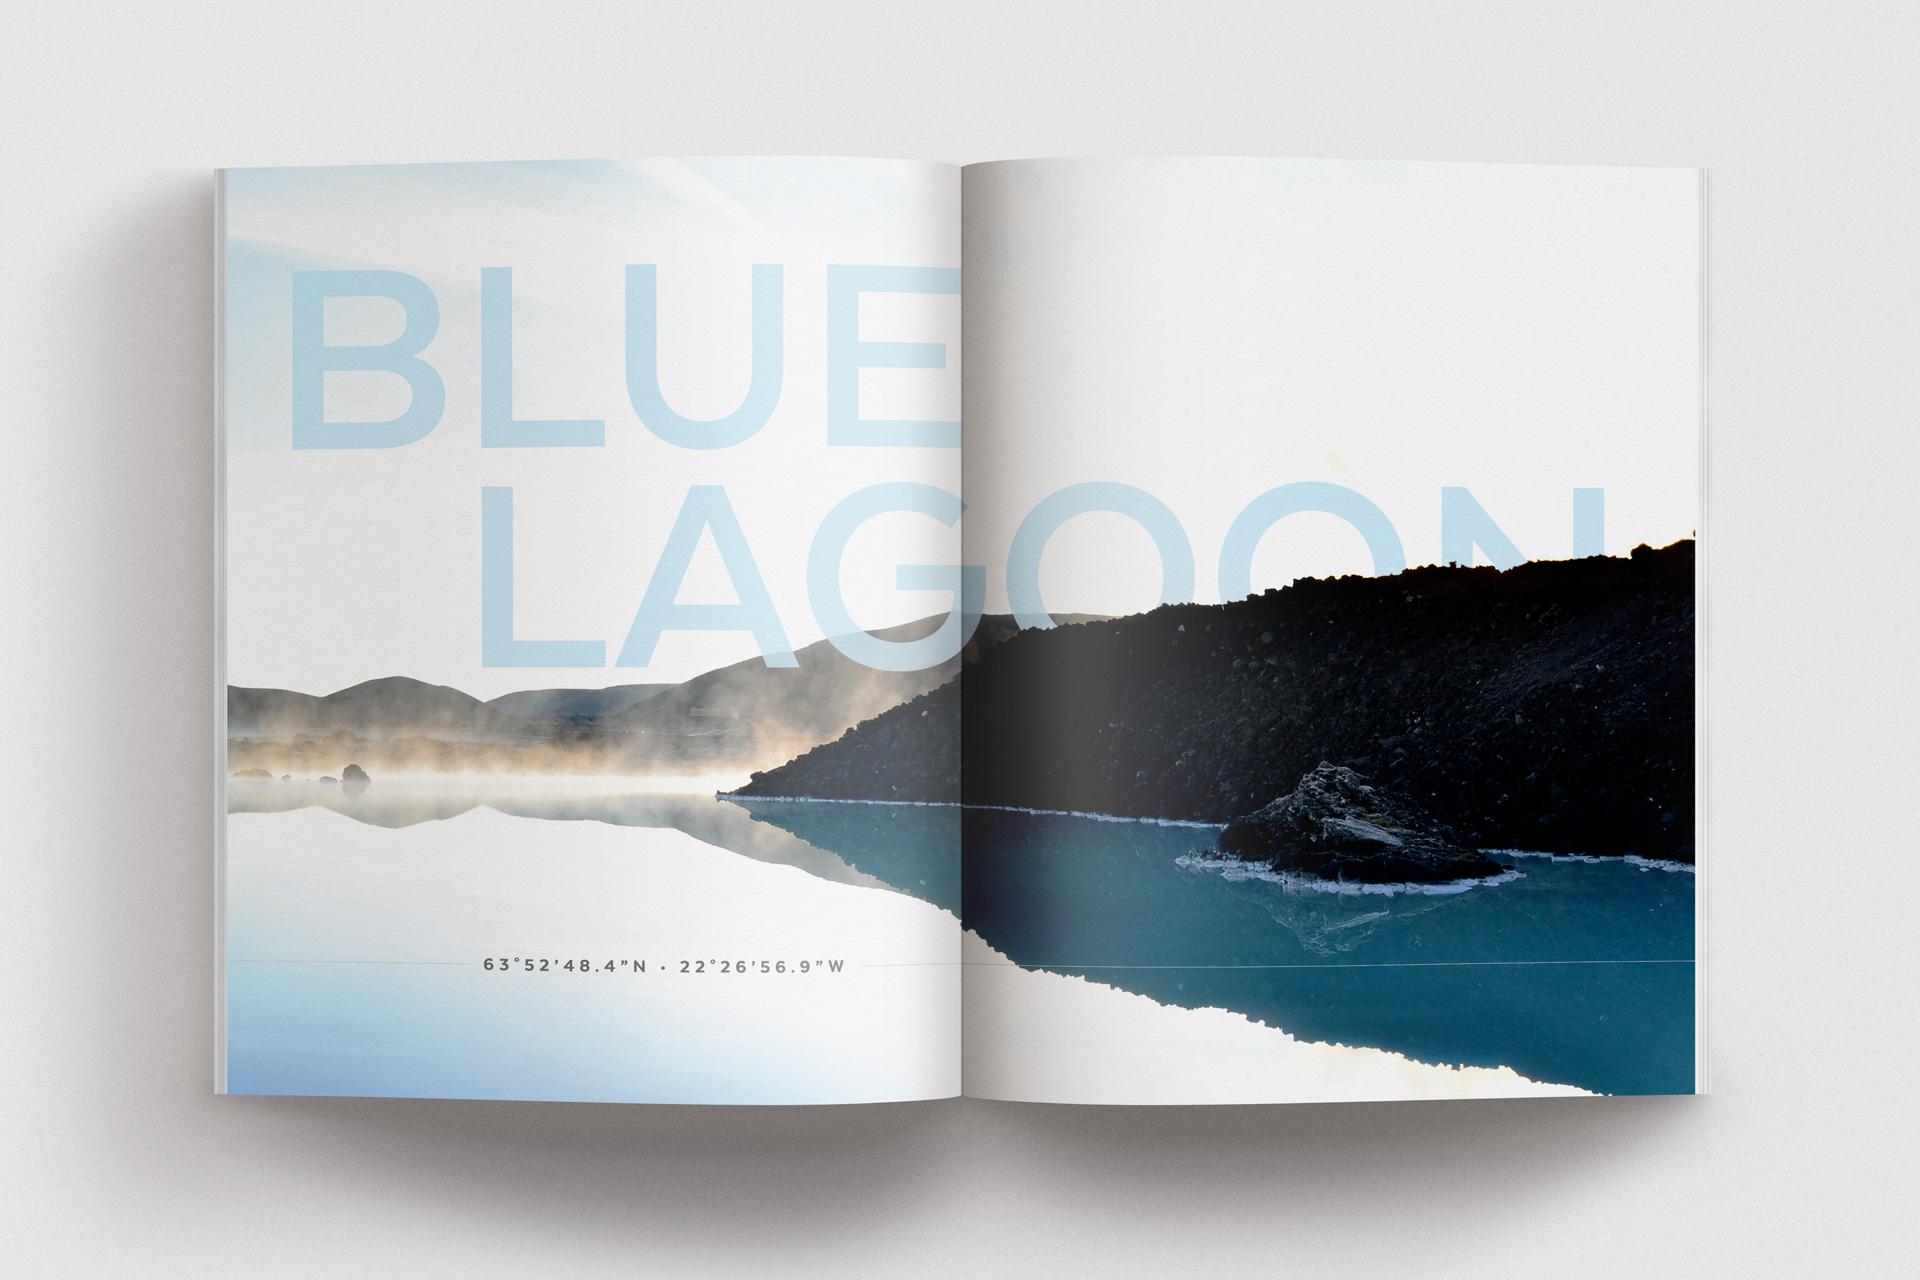 icelandbook_day1_lagoon.jpg